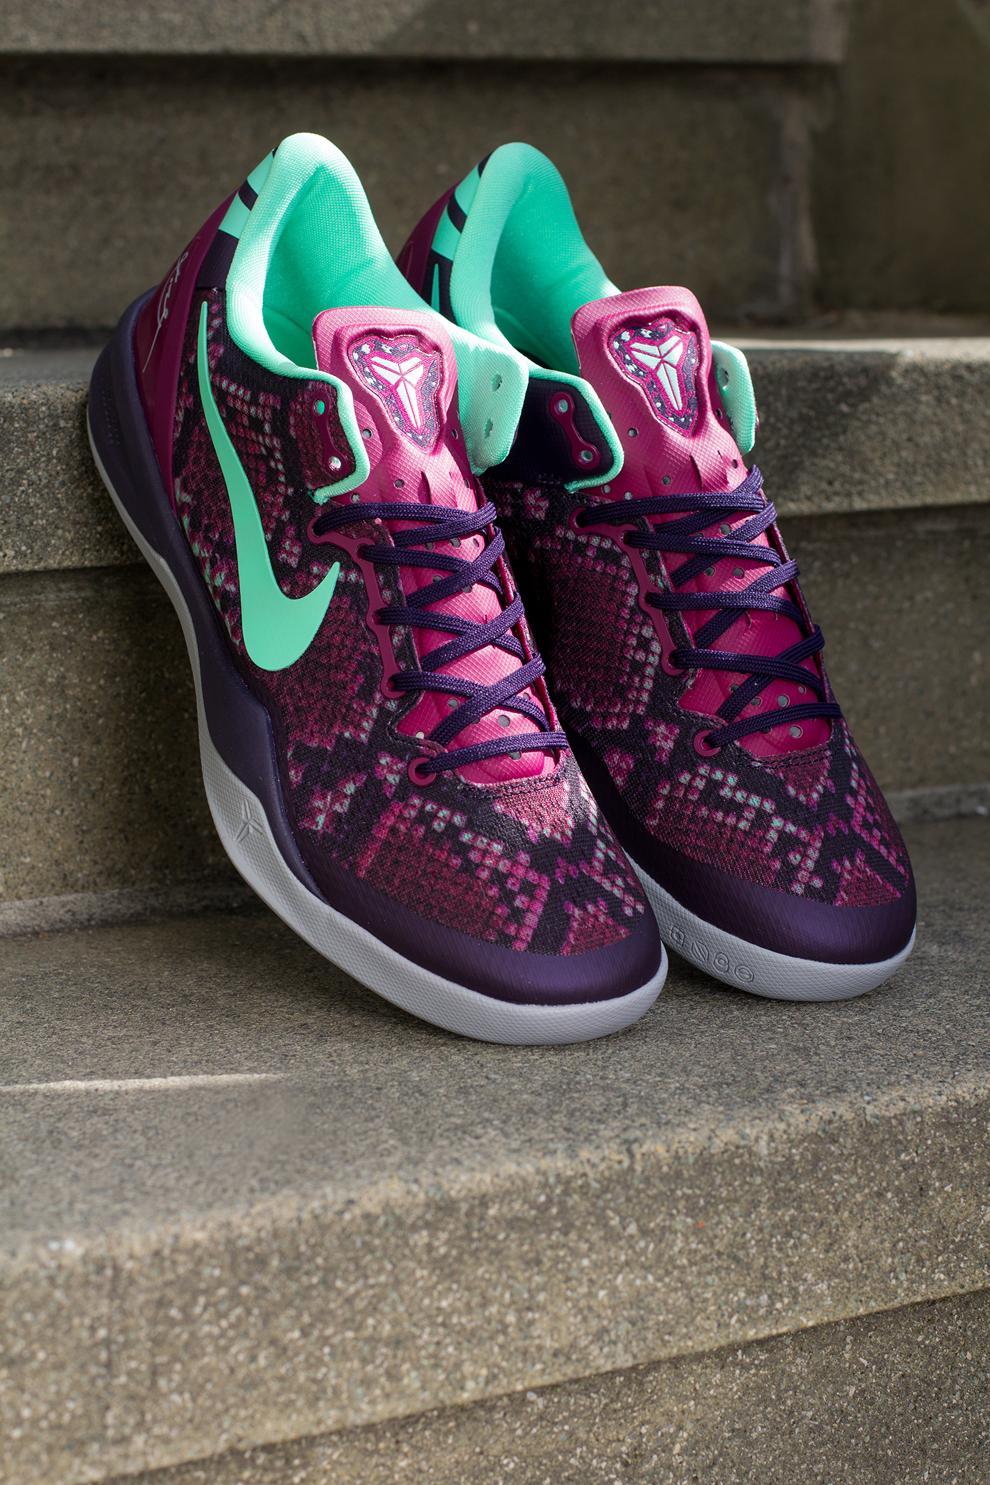 3f46b4cb559a Nike Kobe 8 System Pit Viper (7) Nike Kobe 8 Pit Viper (Detailed Pics  Release Reminder) Nike Kobe ...